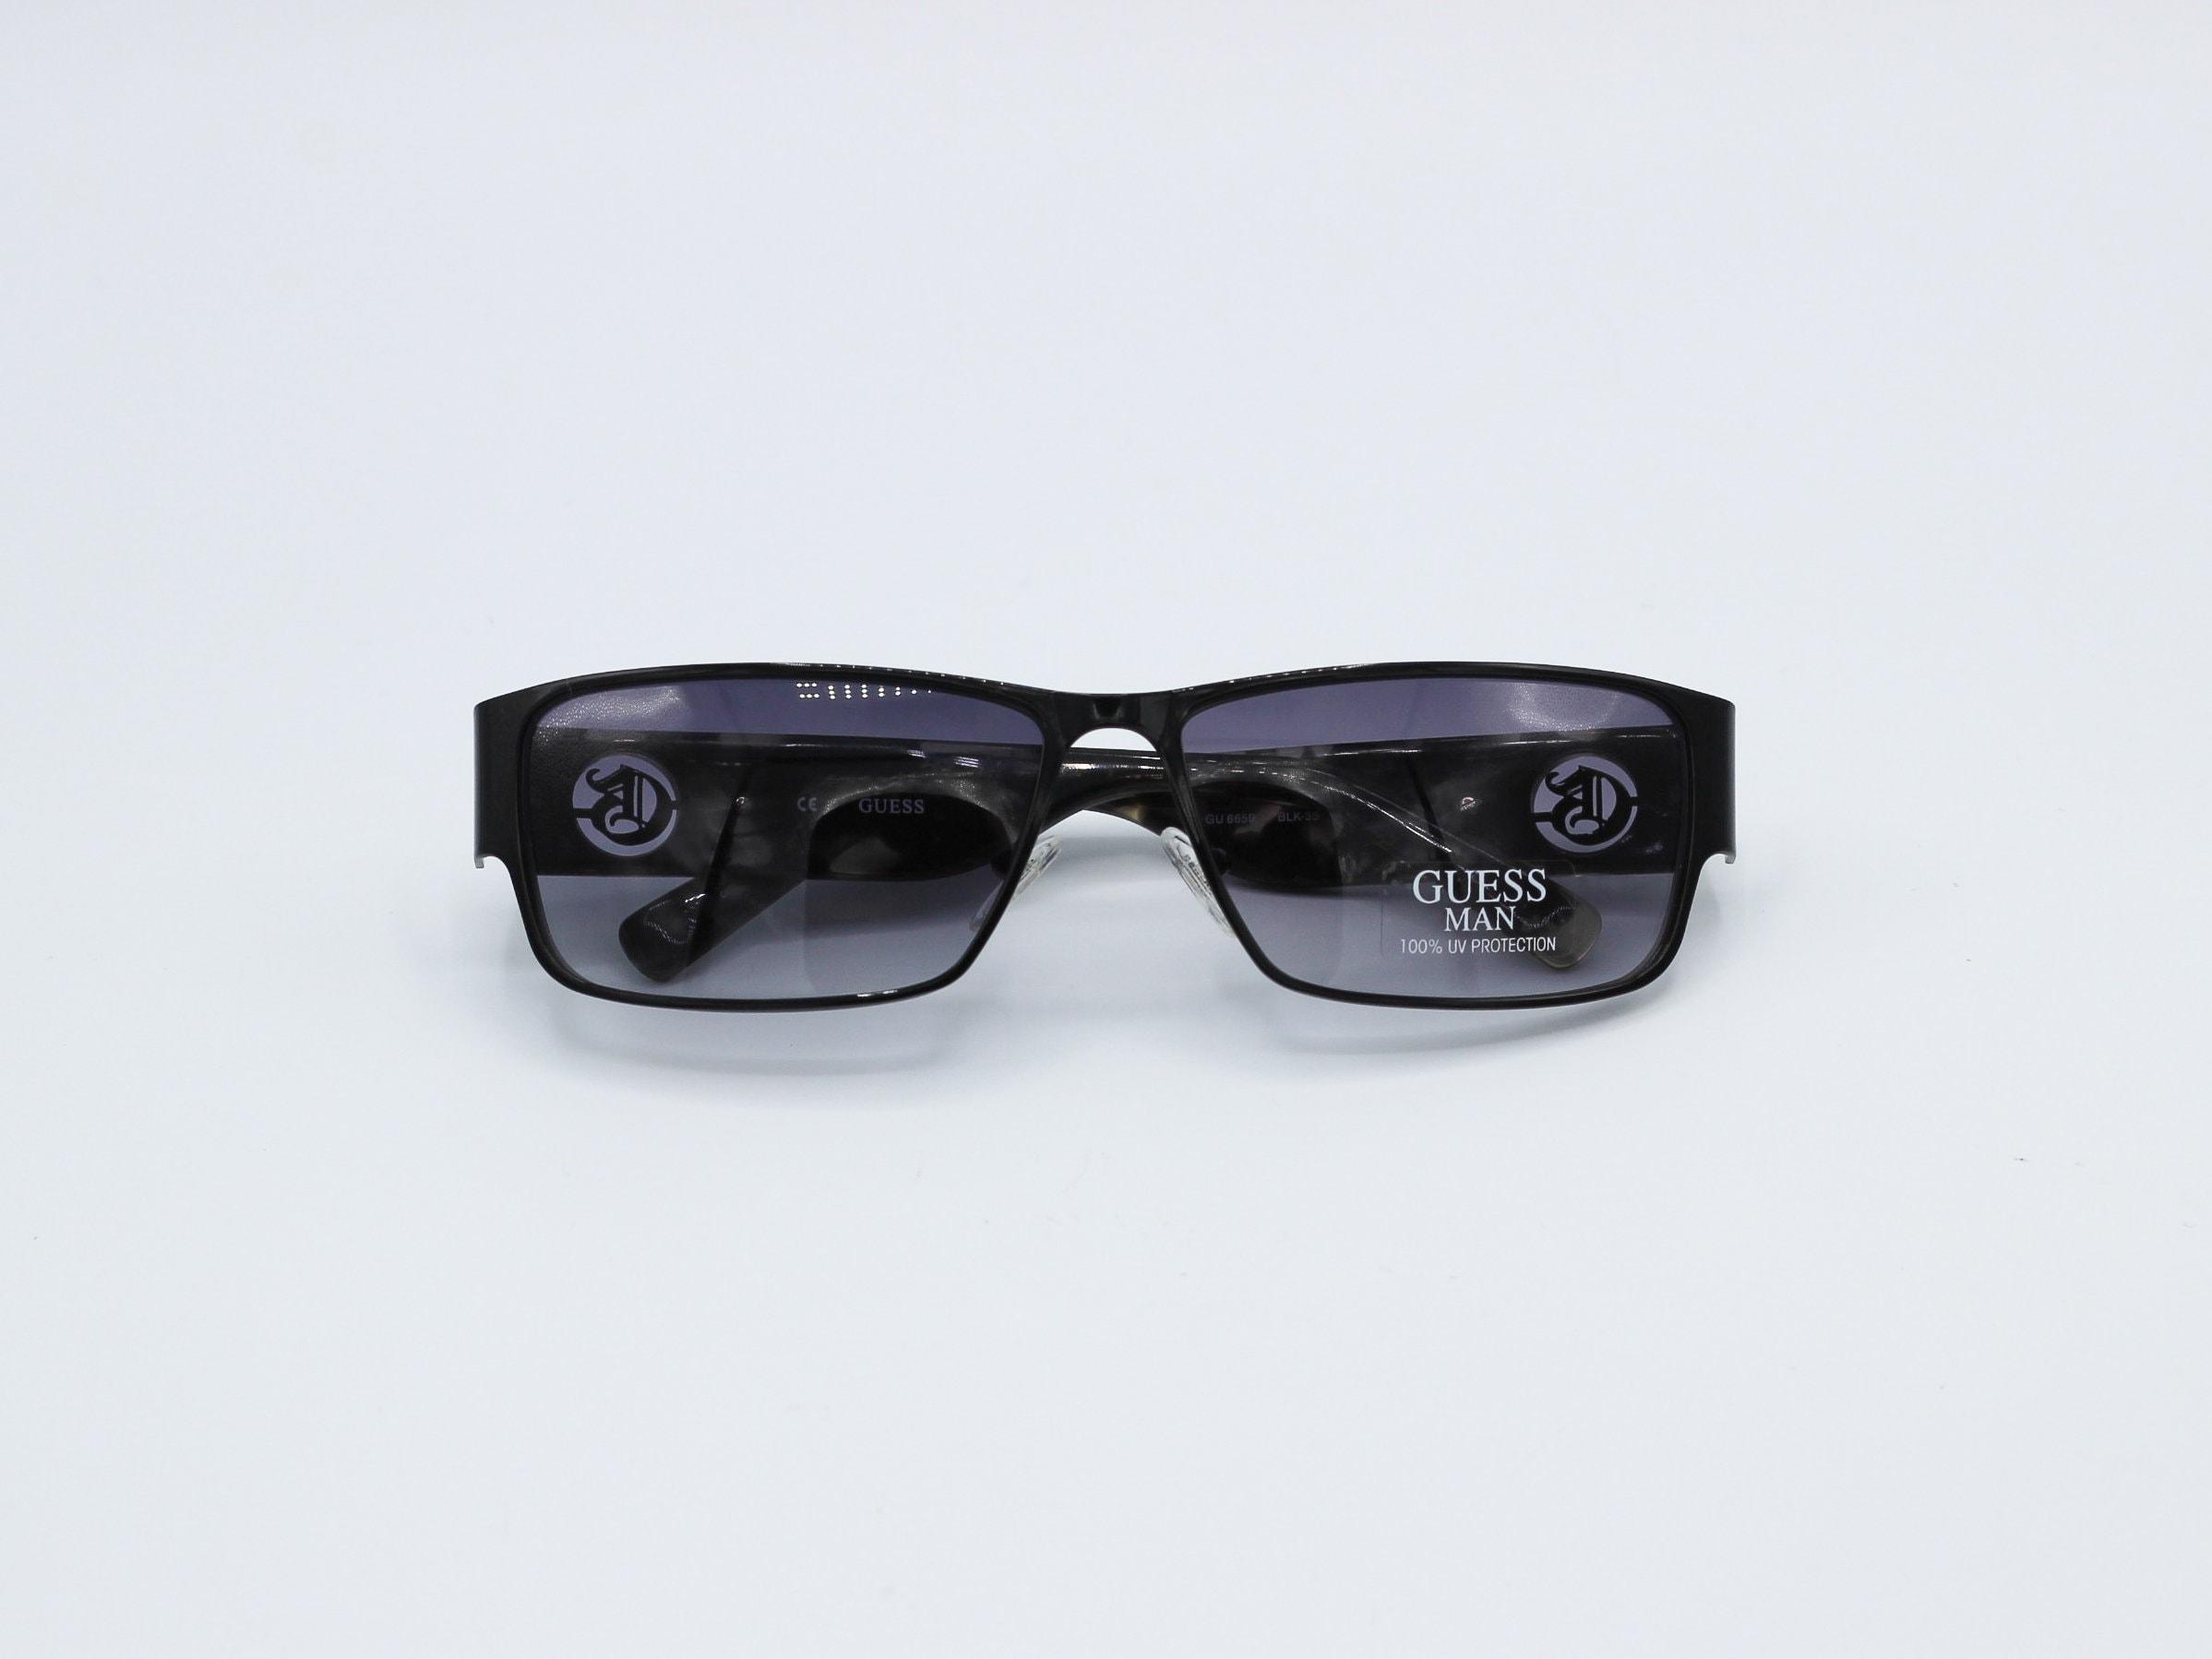 16925e3567c31 Vintage Guess MAN Square Sunglasses 90s Fashion Retro